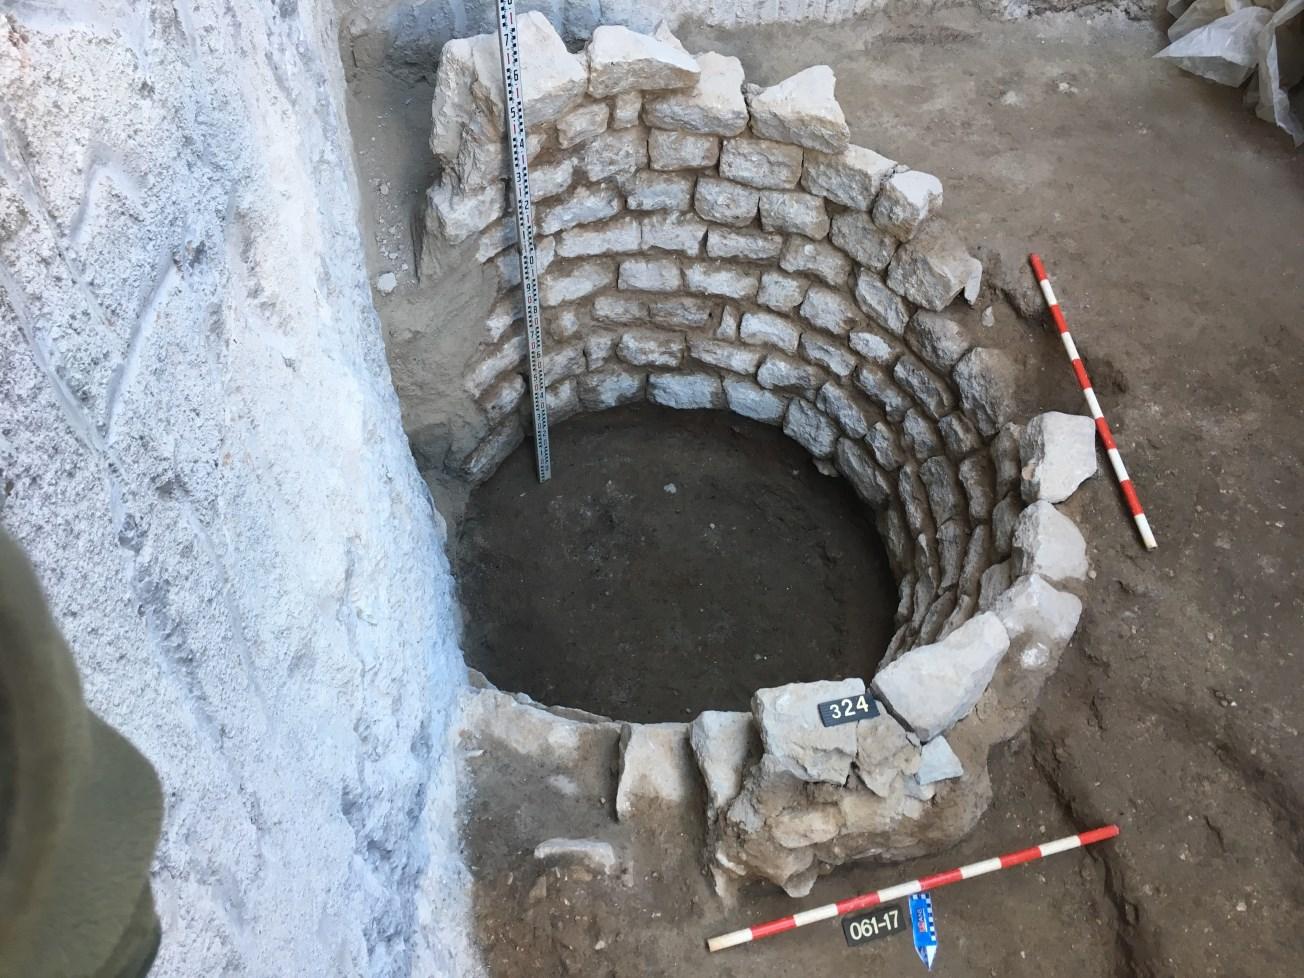 Sitja obrada datada en el segle XIII. Foto: Joan Piera